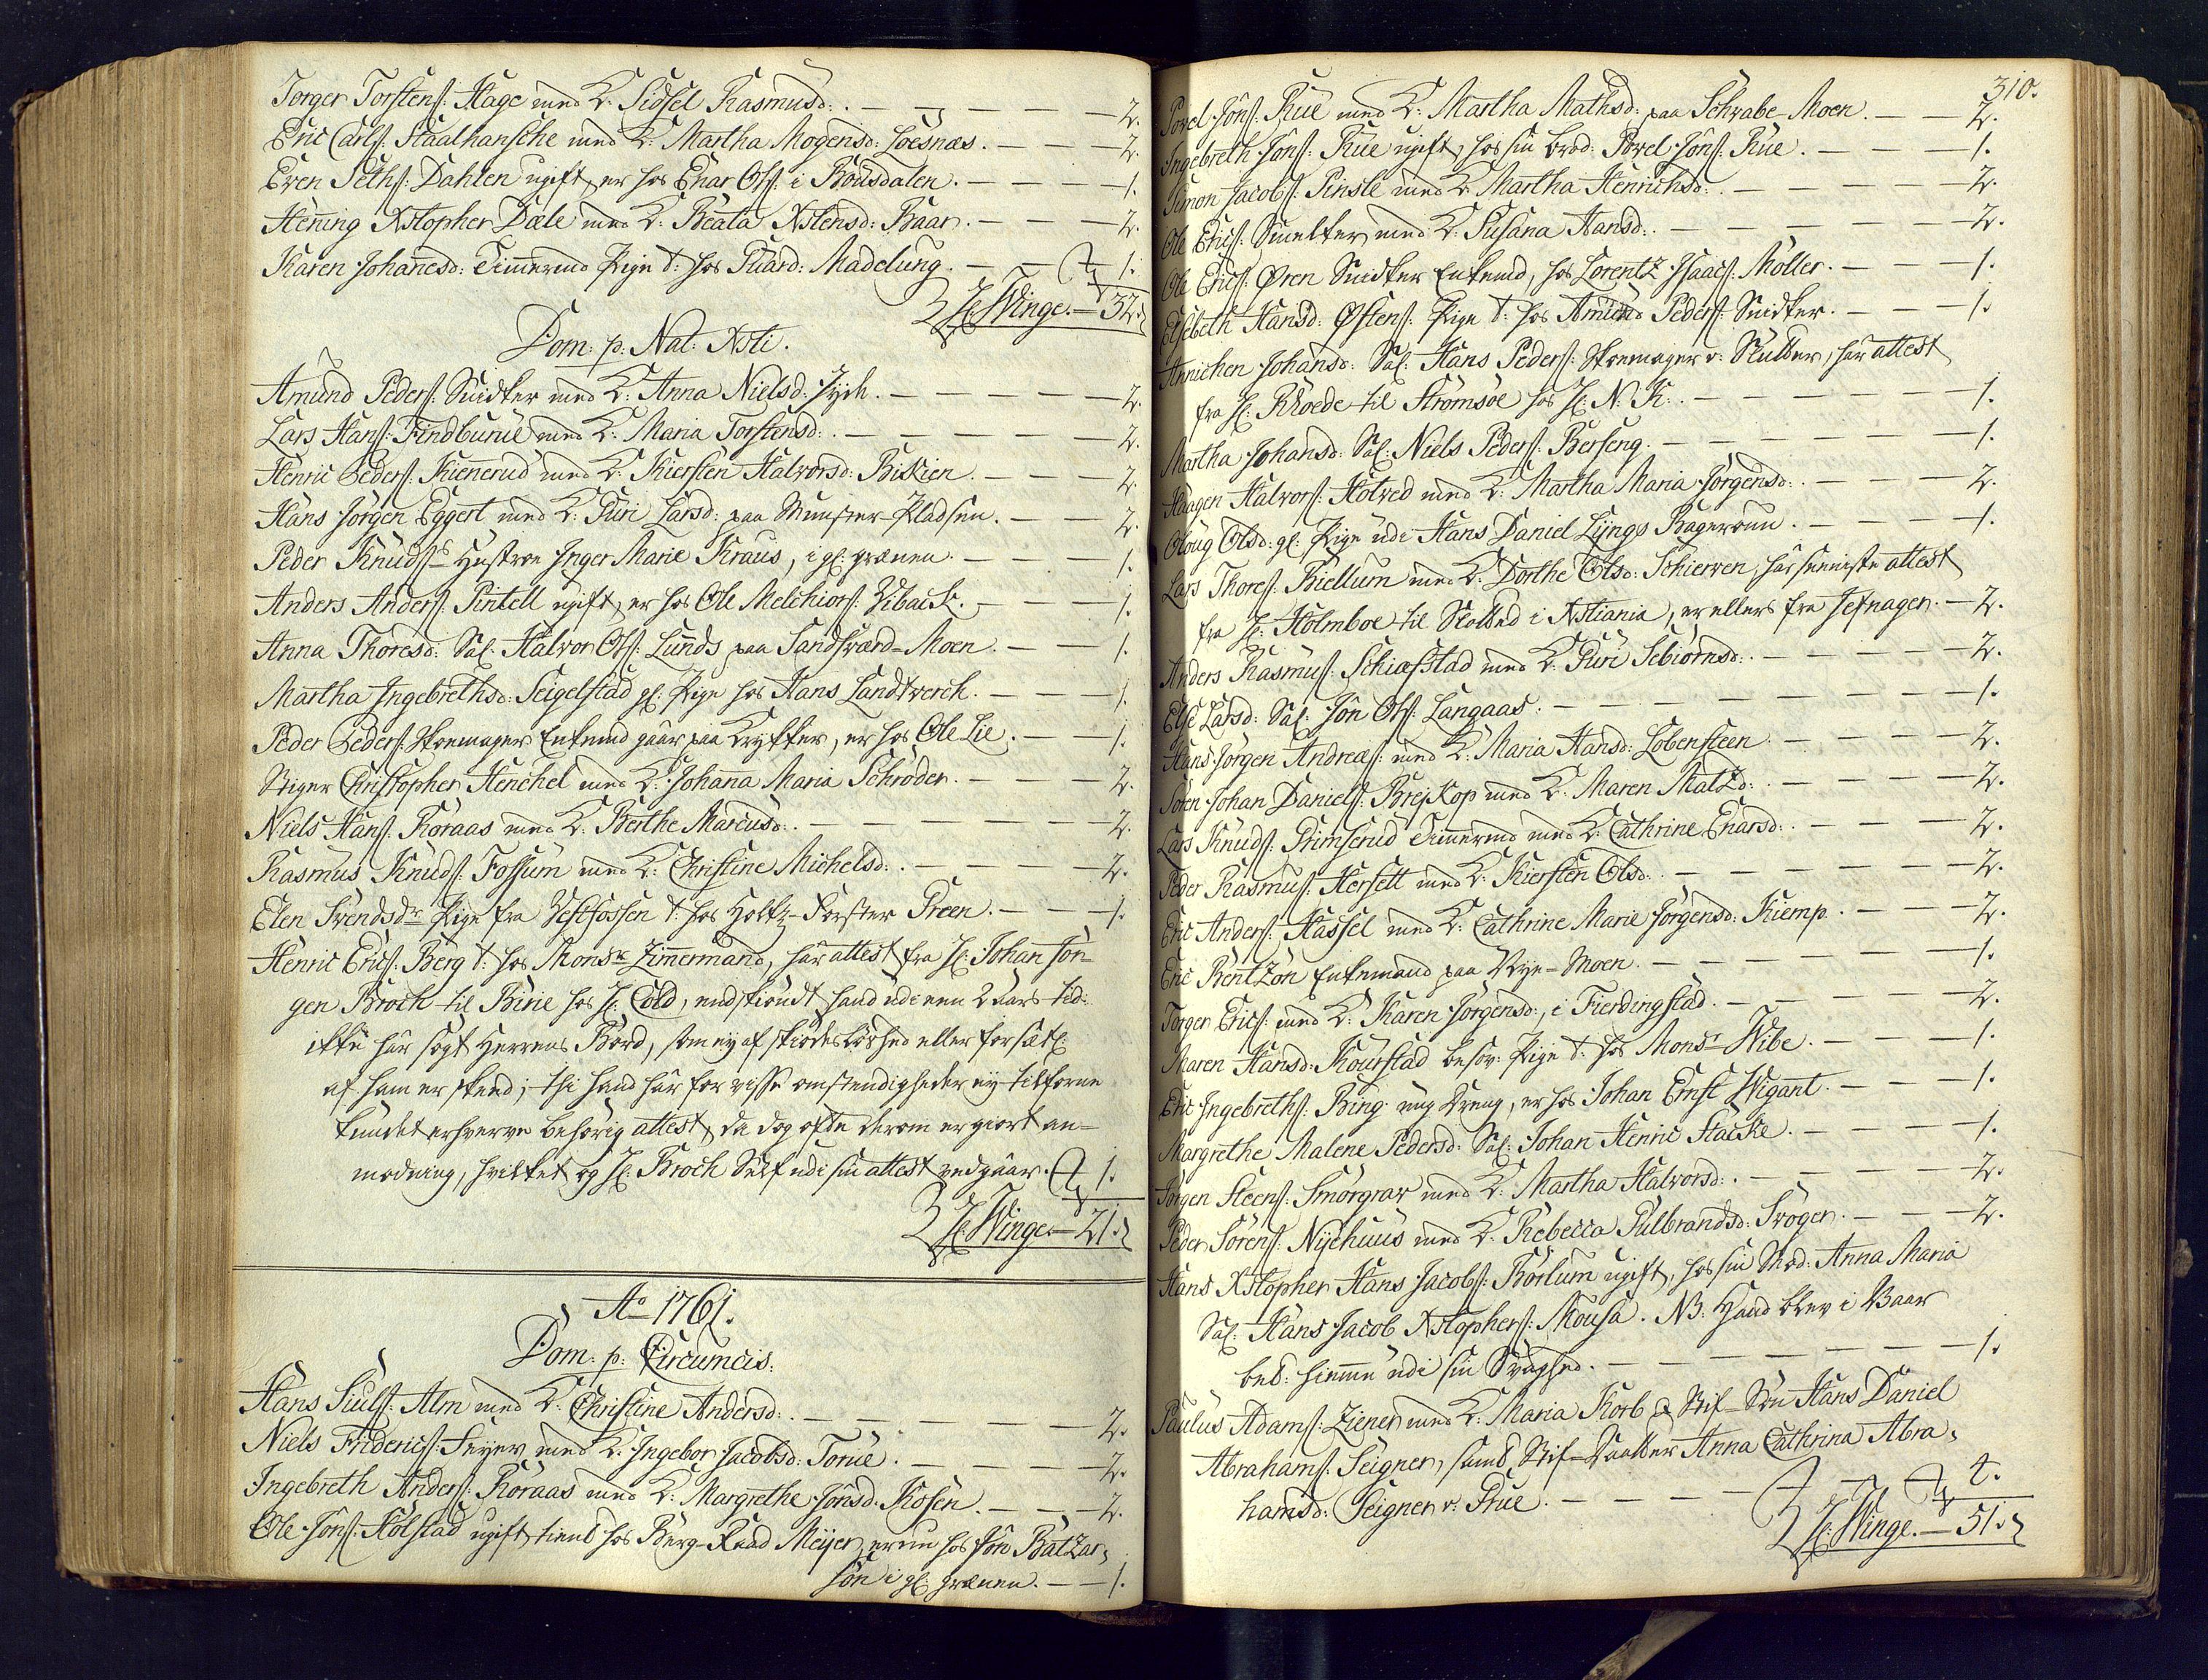 SAKO, Kongsberg kirkebøker, M/Ma/L0005: Kommunikantprotokoll nr. 5, 1755-1761, s. 310